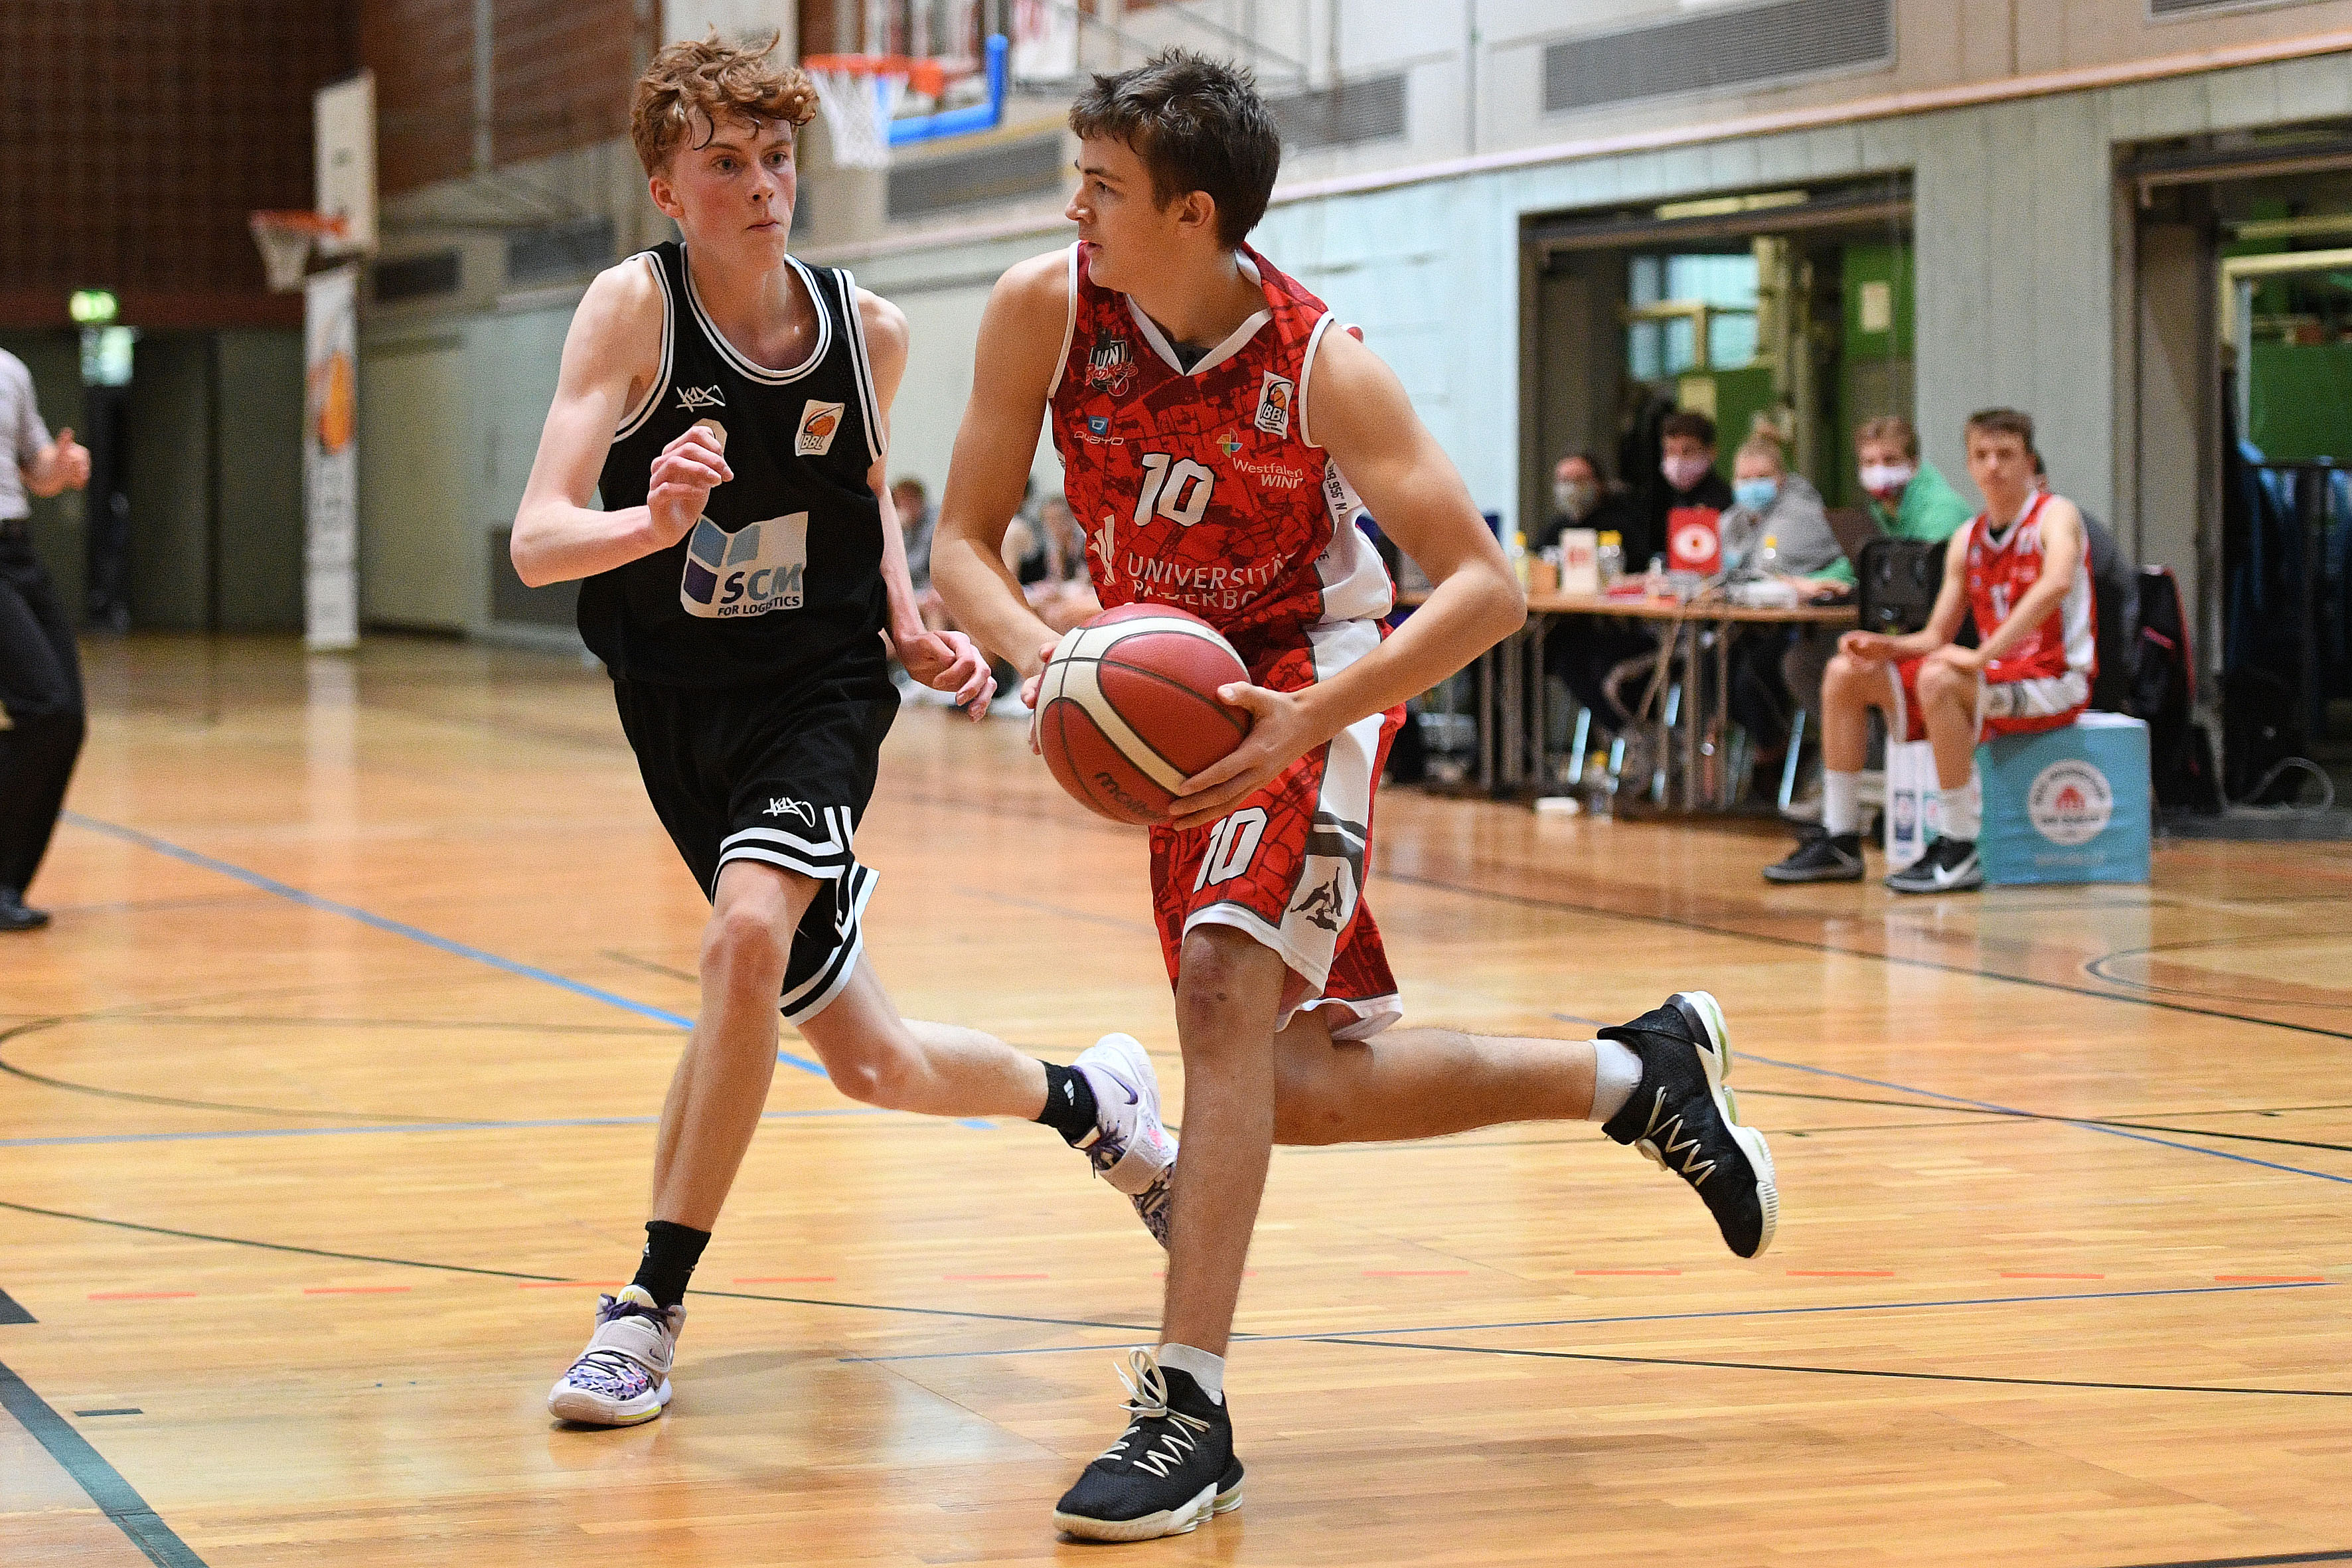 2020-10-18-JBBL-Uni-Baskets-Paderborn-UBC-Muenster_8438